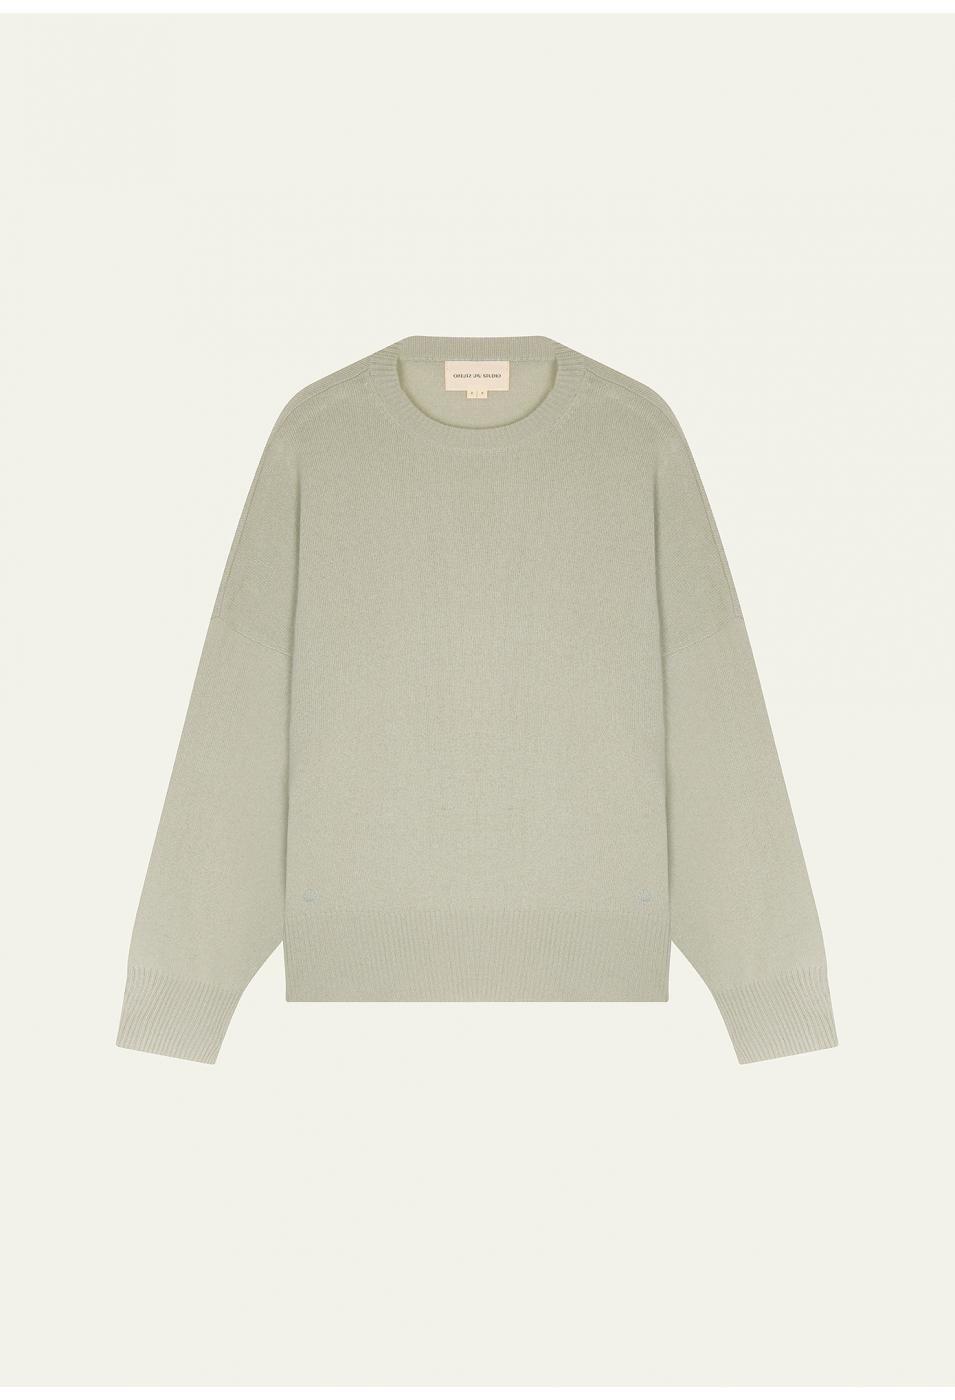 ANAA Cashmere Sweater